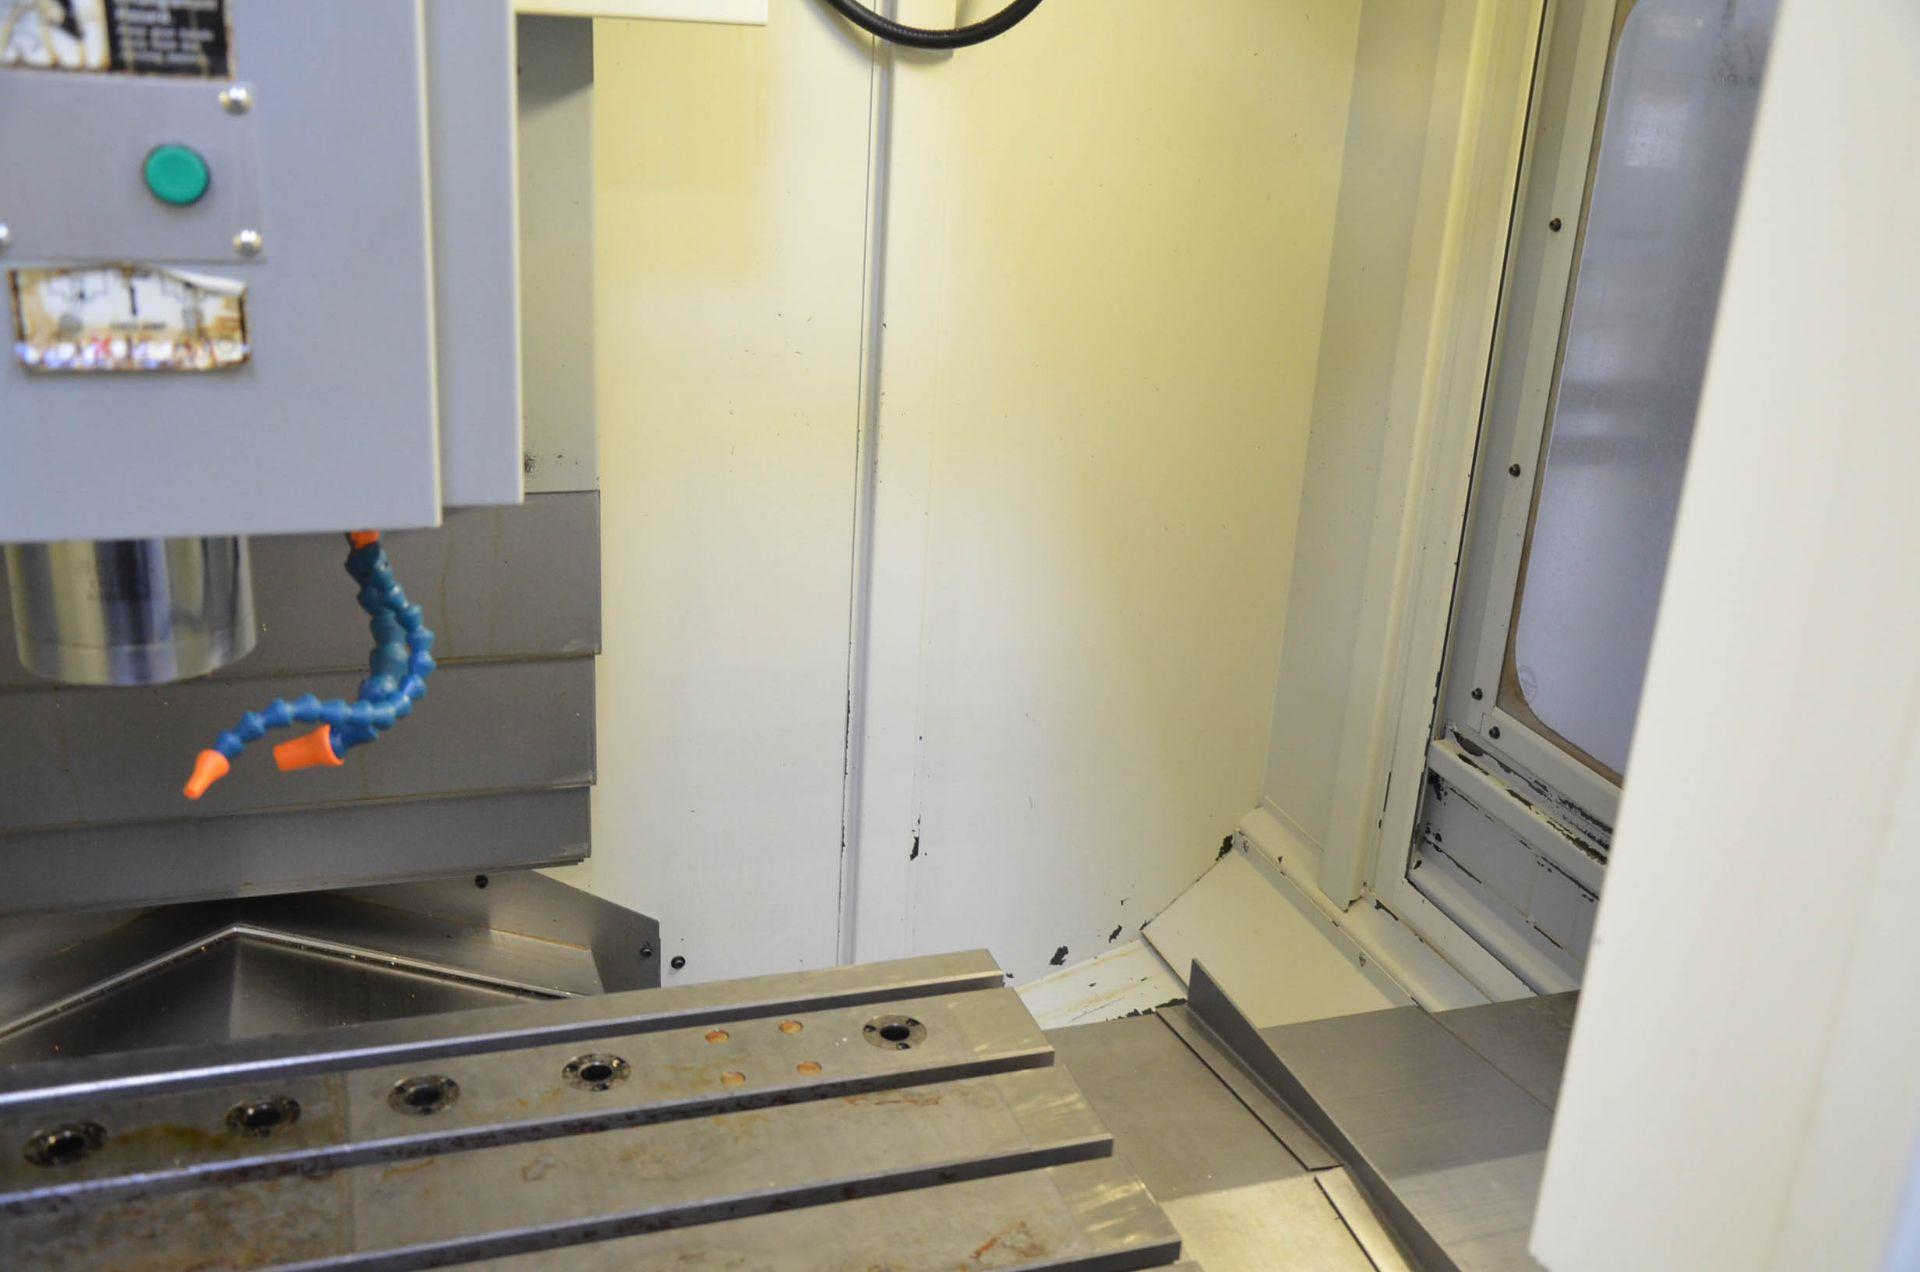 "SWI (2014) TRAK LPM CNC VERTICAL MACHINING CENTER WITH PROTO TRAK PMX CNC CONTROL, 19.5"" X 35.5"" - Image 6 of 9"